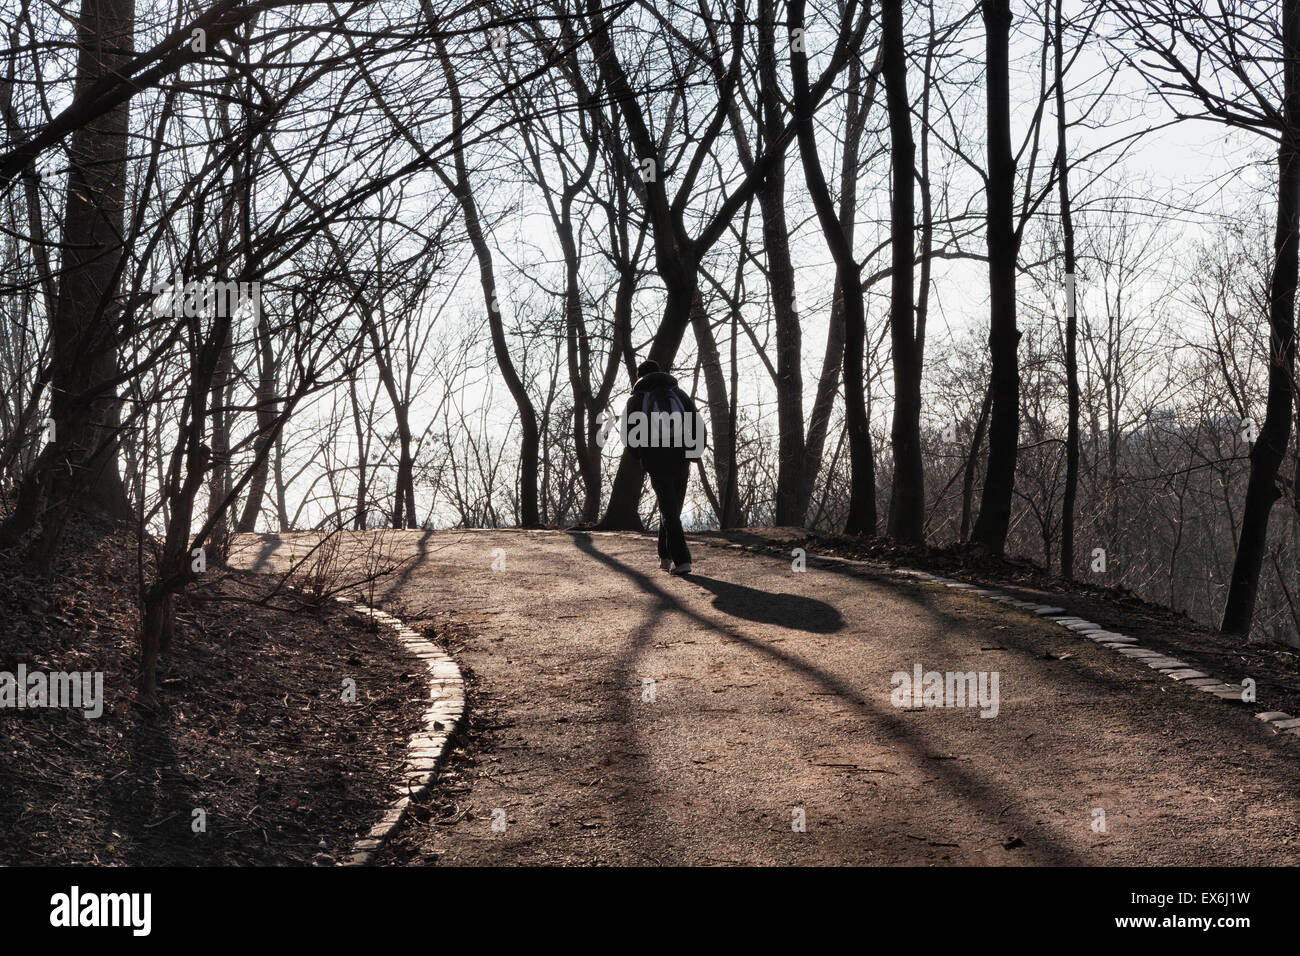 Humboldthain Stockfotos & Humboldthain Bilder - Alamy